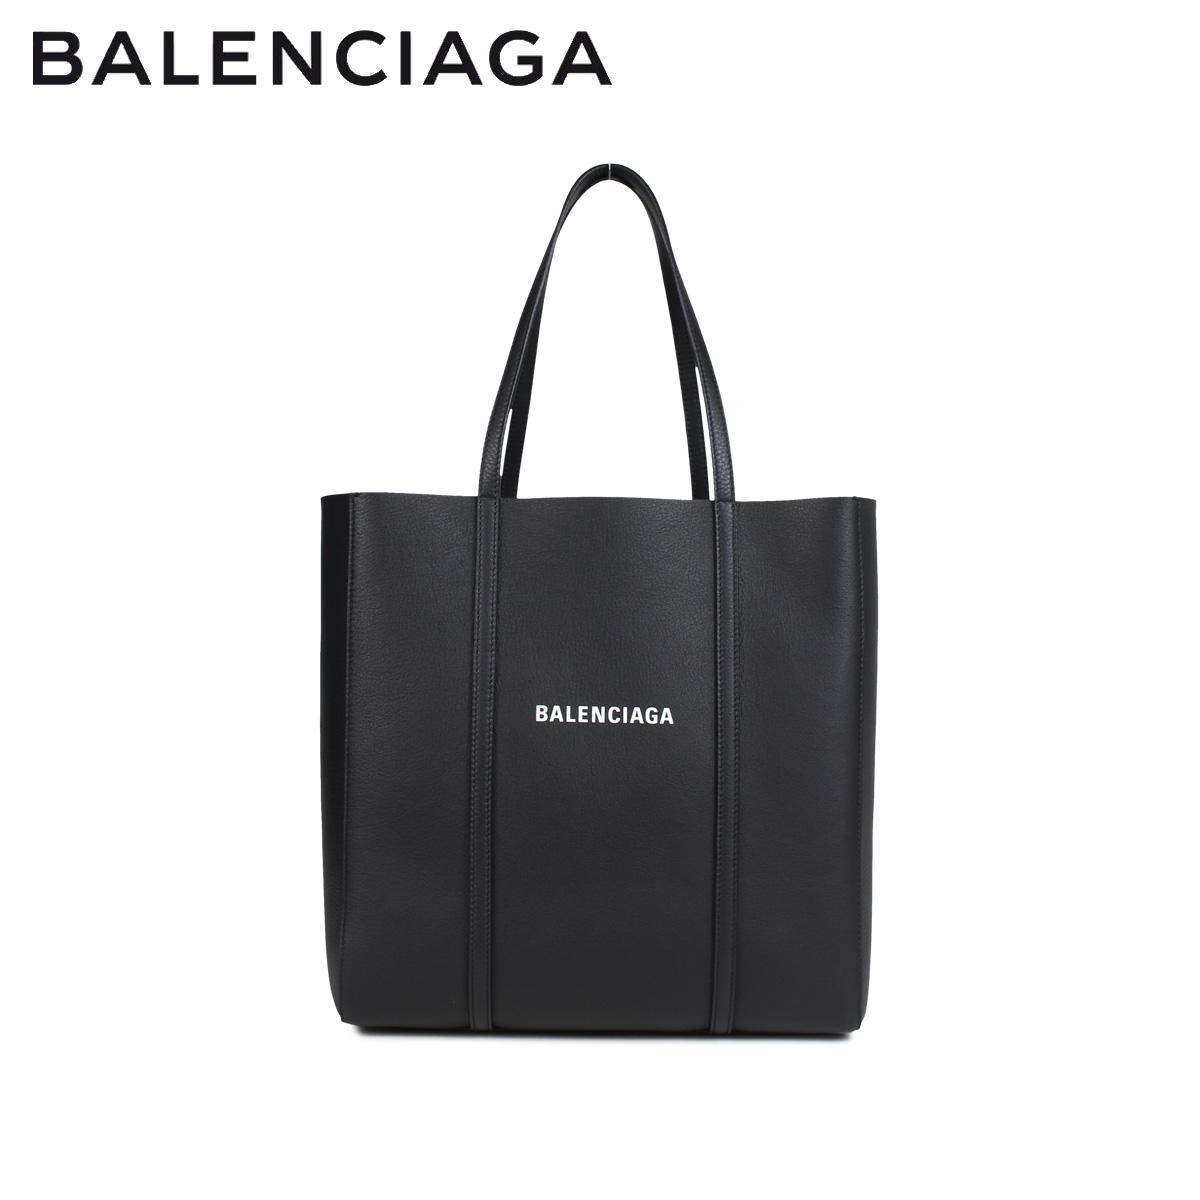 BALENCIAGA EVERYDAY TOTE S バレンシアガ バッグ トートバッグ レディース レザー ブラック 黒 551812 D6W2N